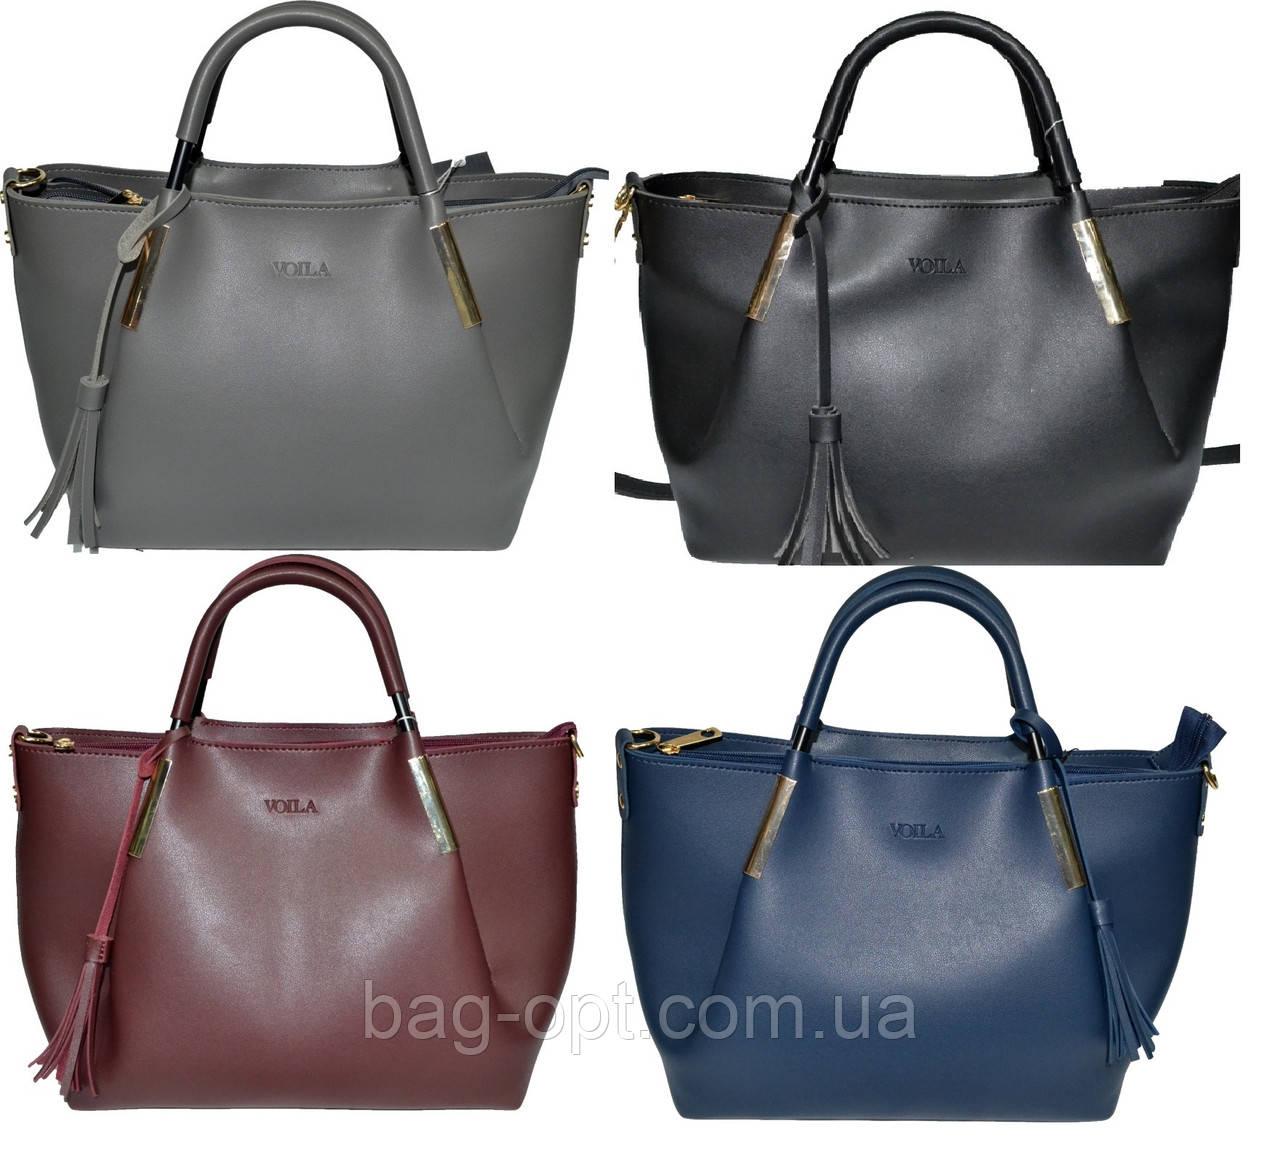 3bfe67d490e9 Женская сумка Wallaby: продажа, цена в Харькове. женские сумочки и ...